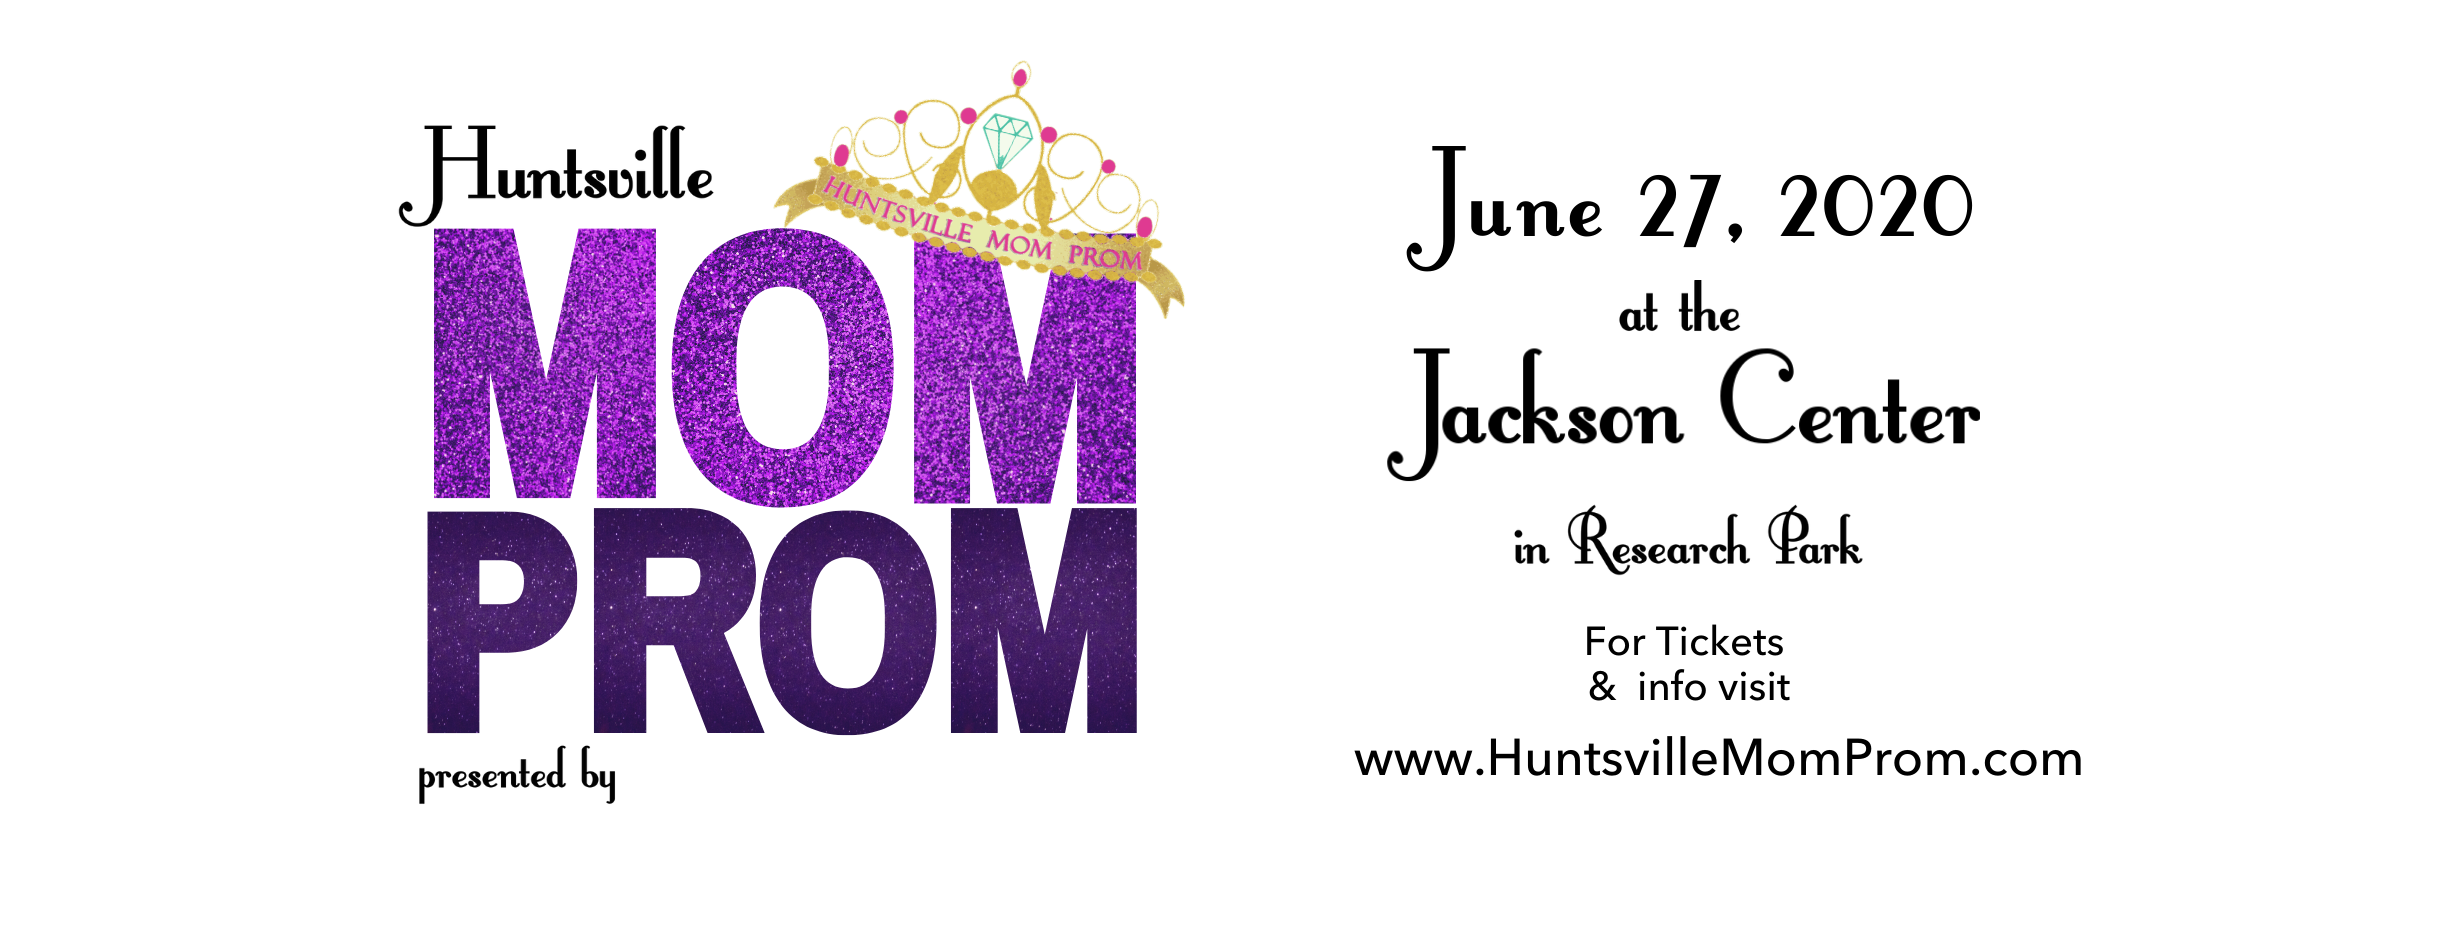 Huntsville Mom Prom: A fundraiser for ICAN of Huntsville, AL